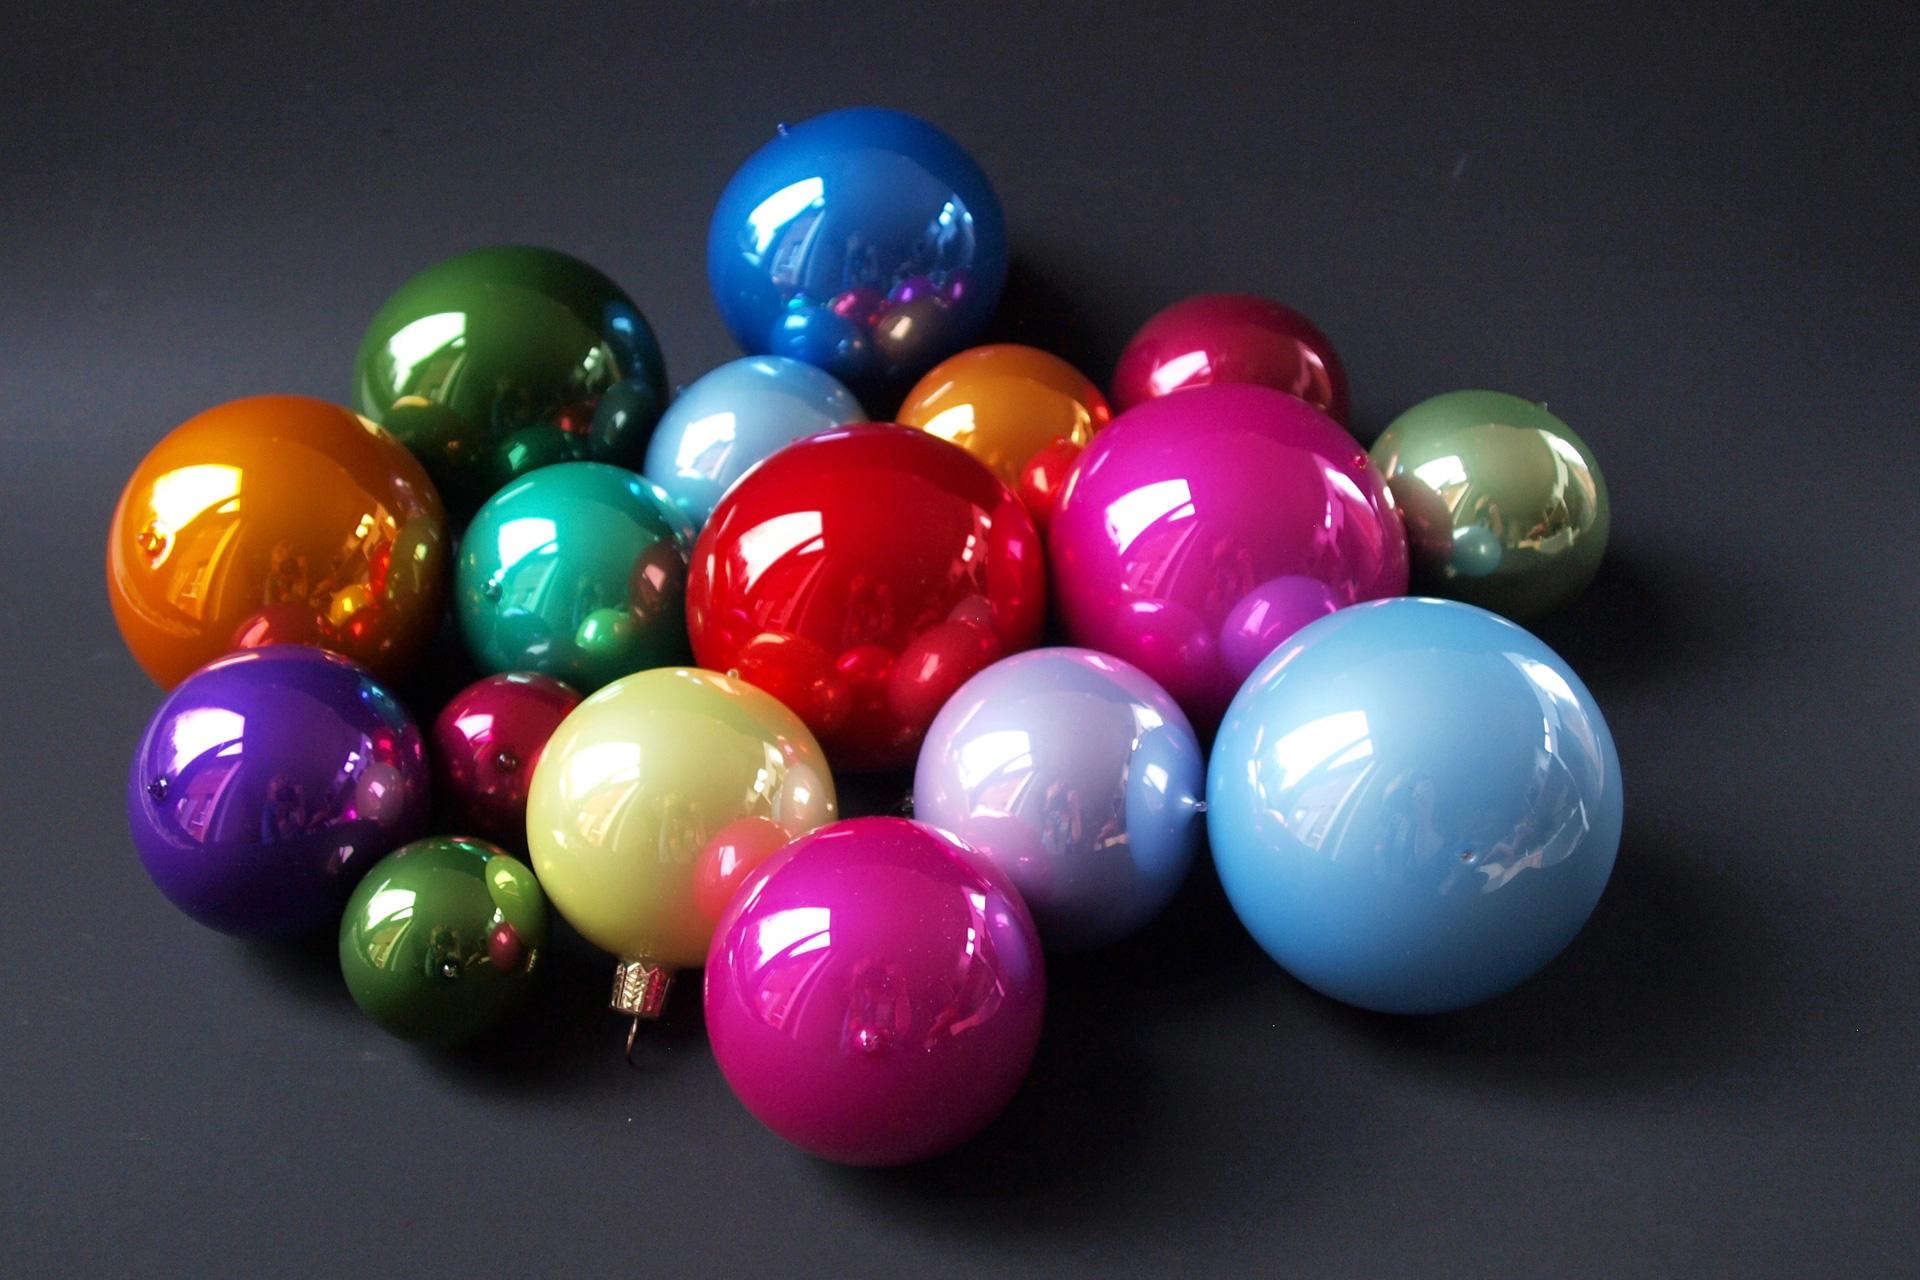 buchstabenplus - MoMA Ornaments